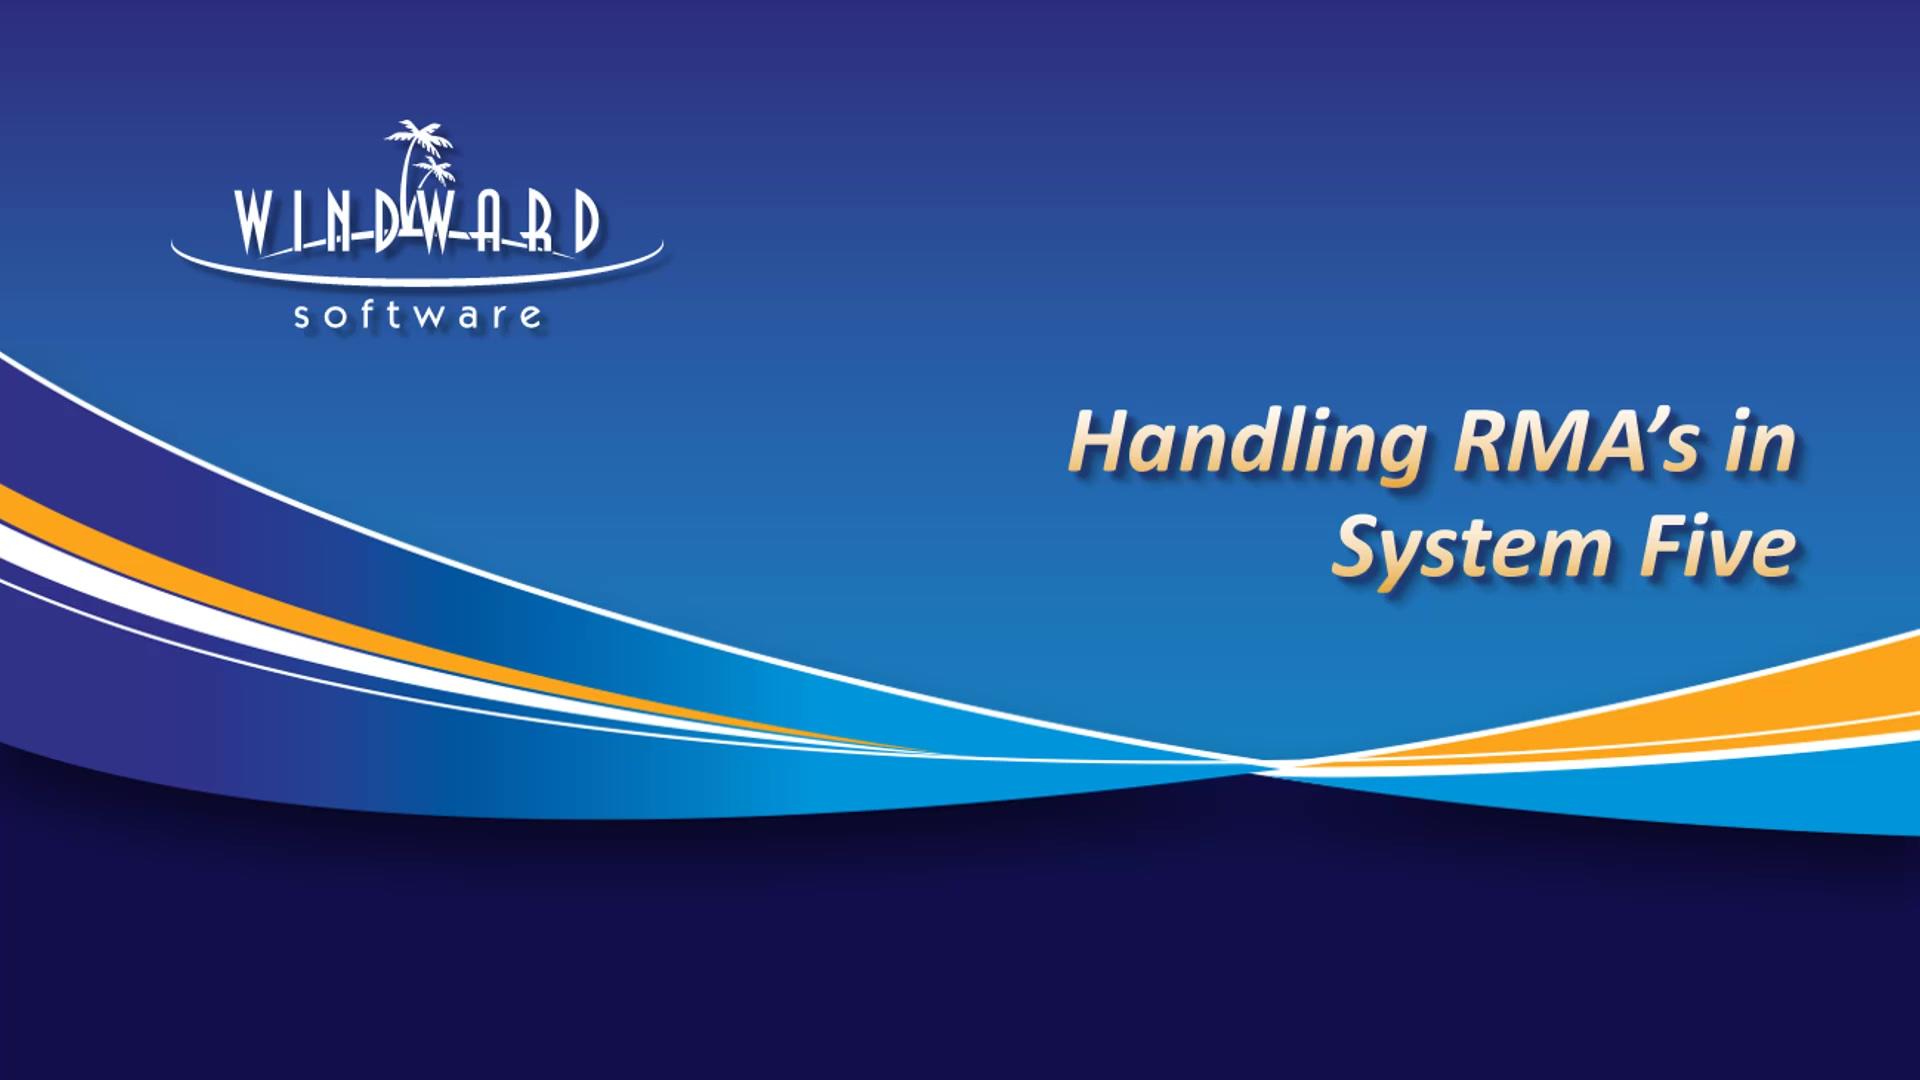 handling-RMA-windward-system-five